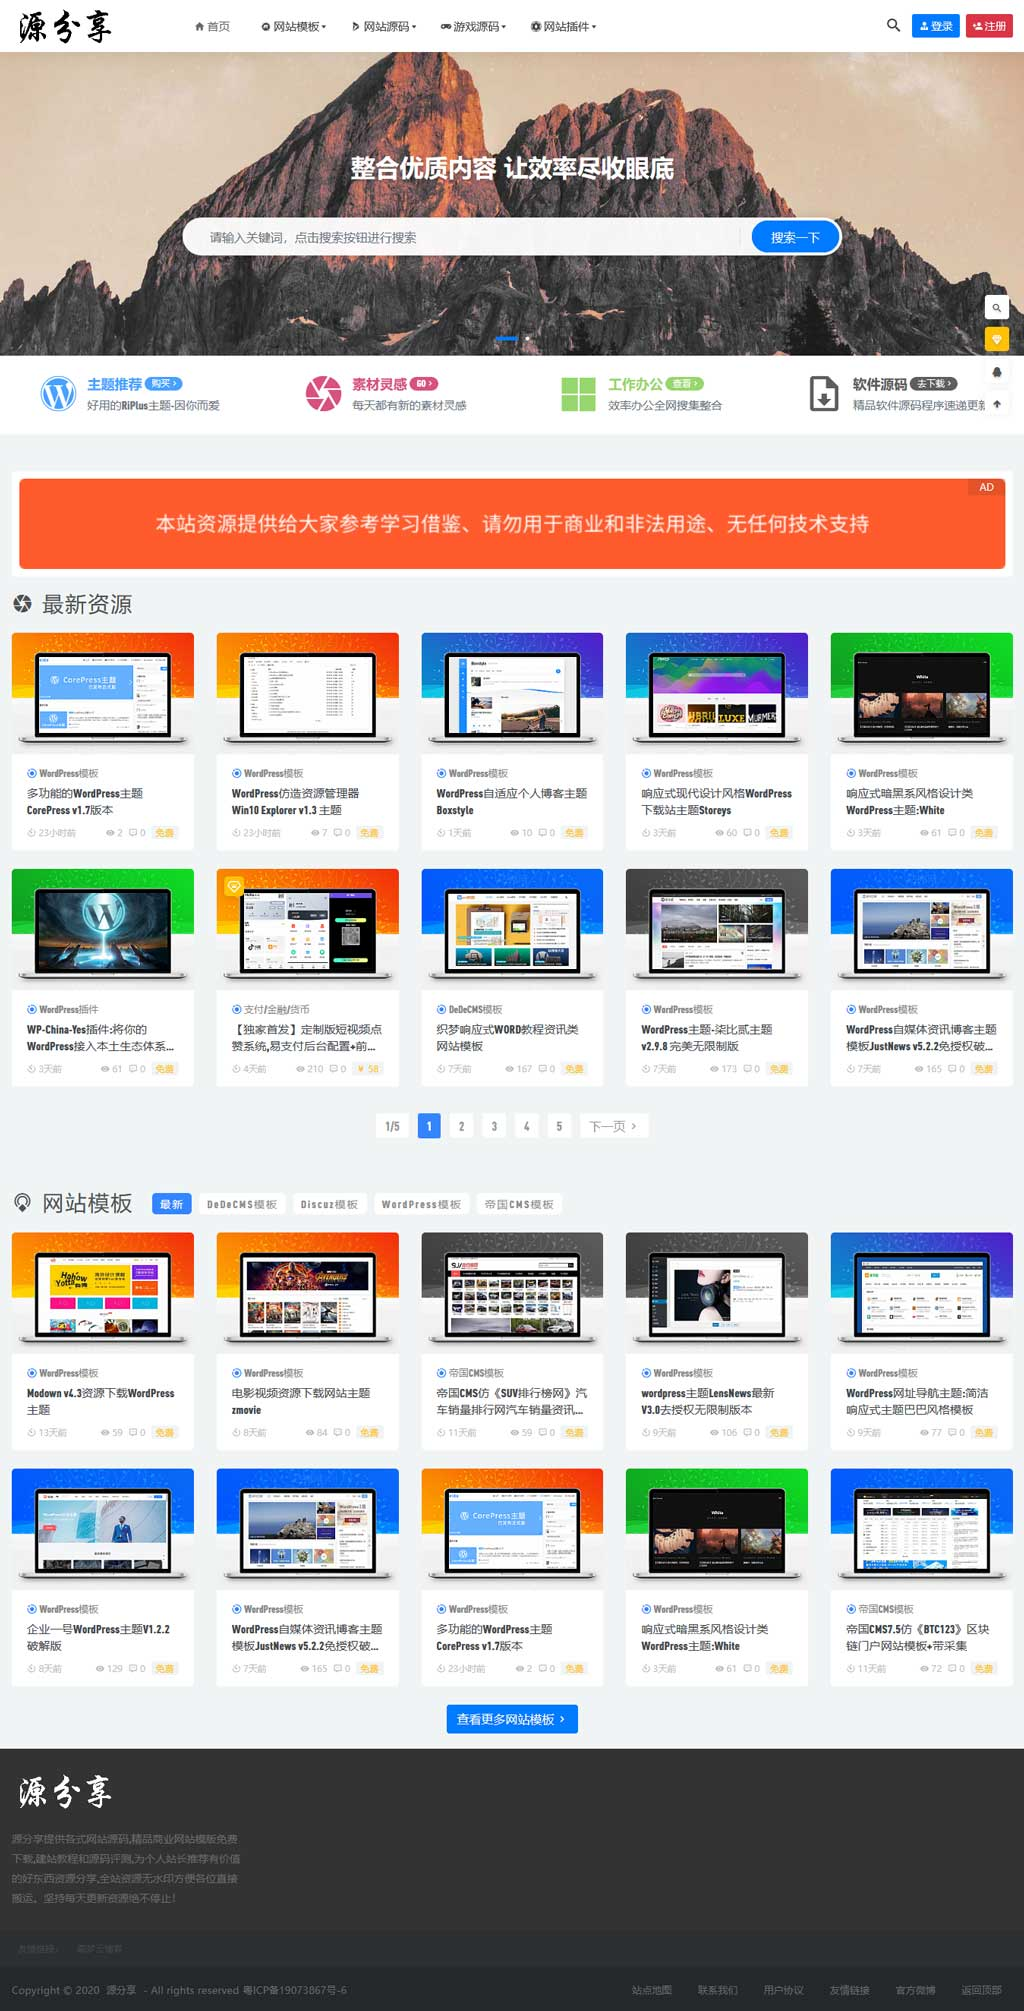 WordPress插件ThnBo让自己的整体站点看上去更加的美观-橘子皮